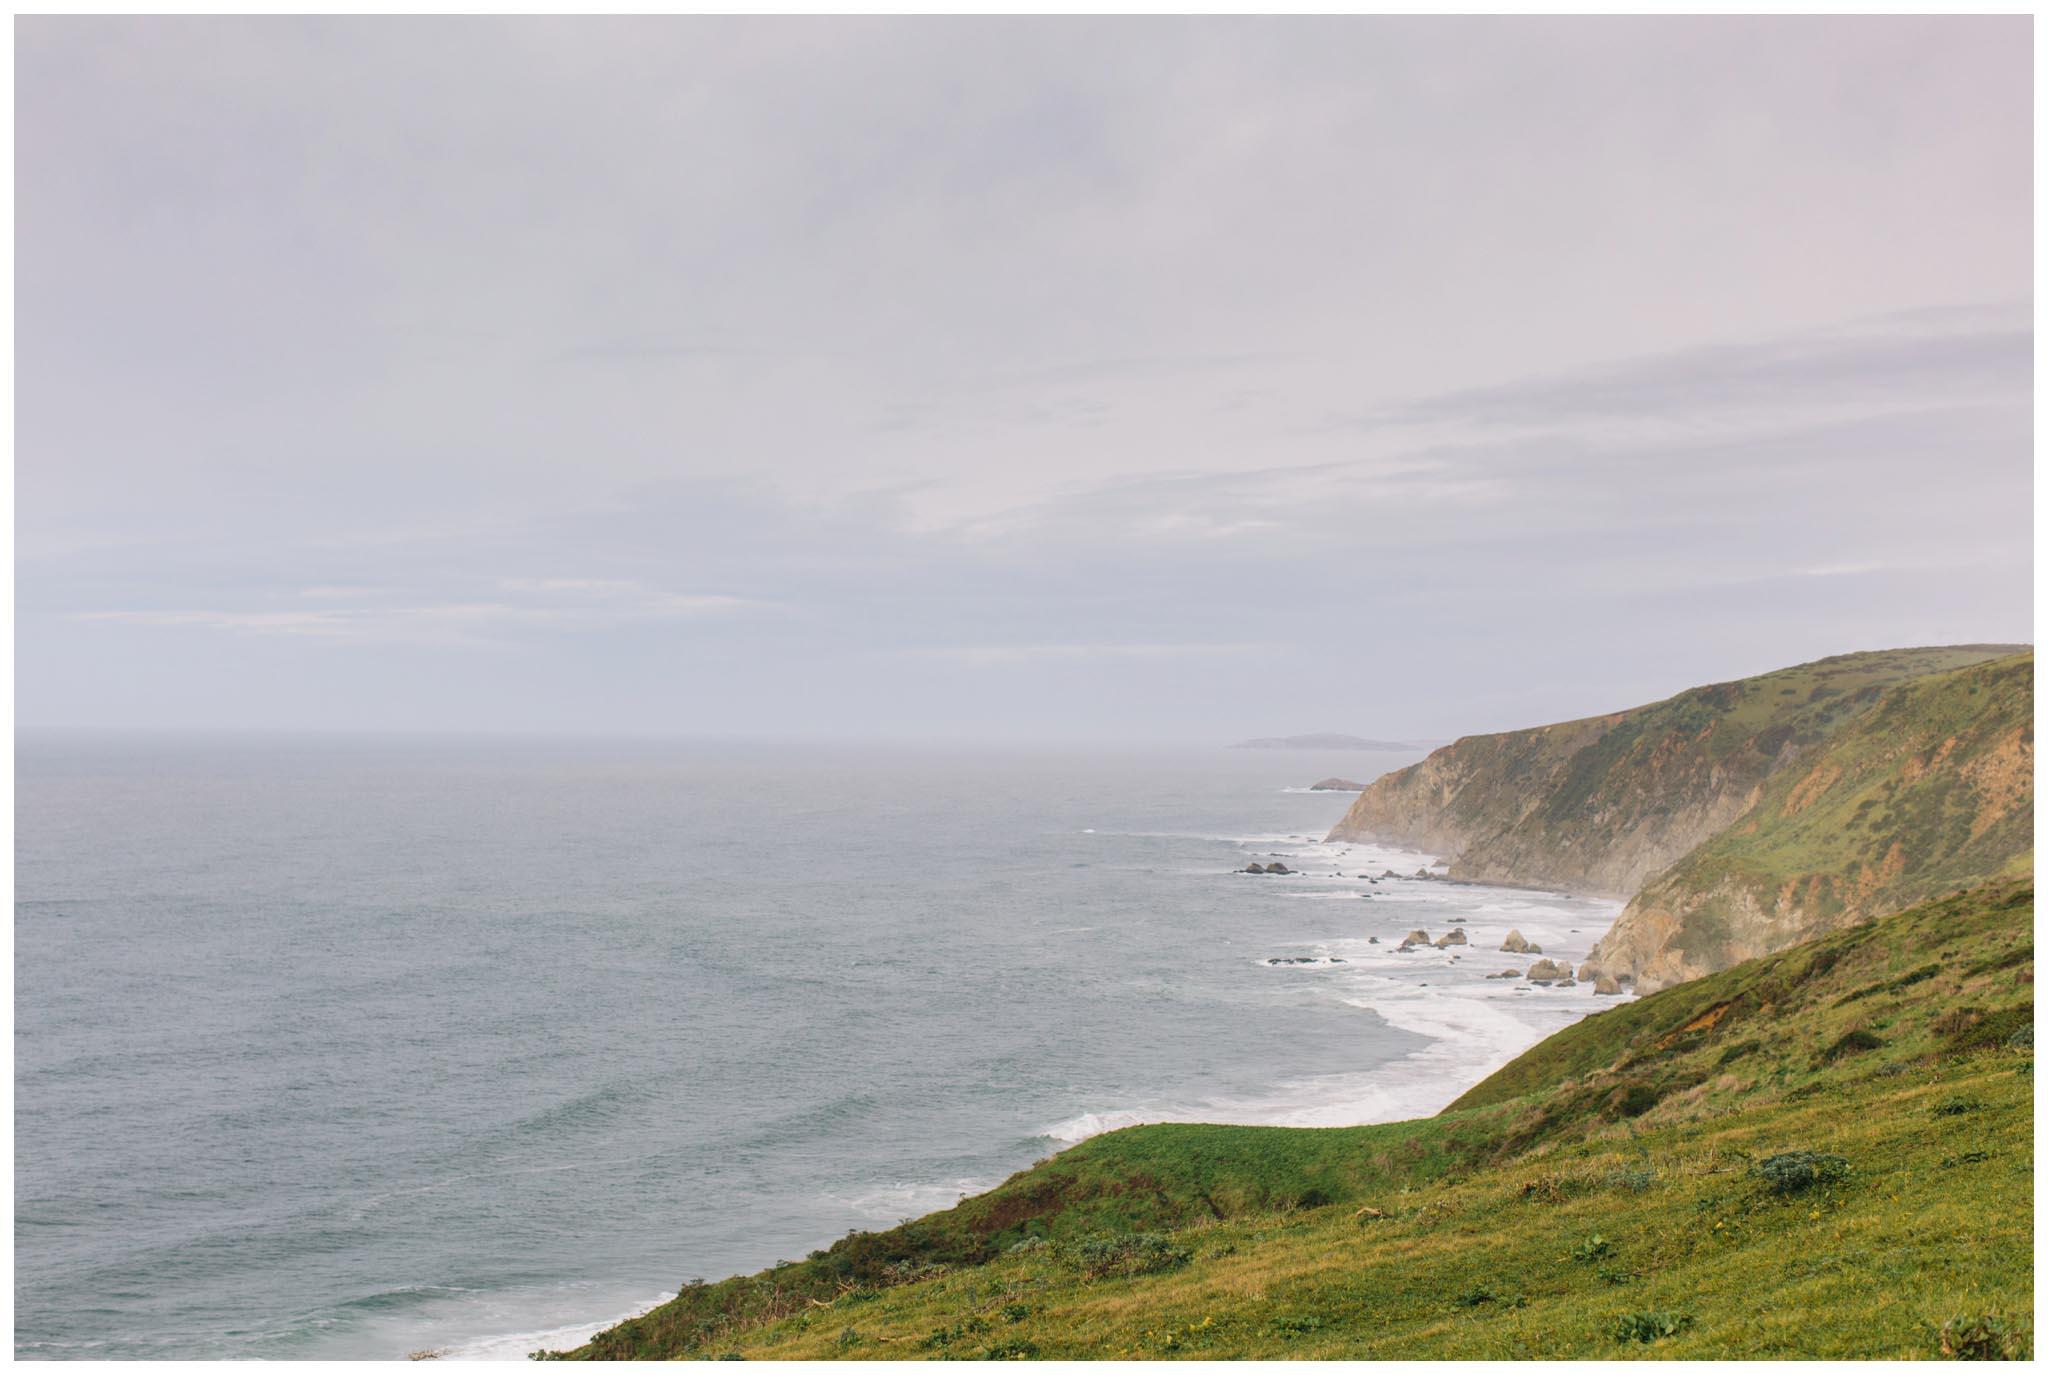 point reyes national seashore, tomales point trailhead